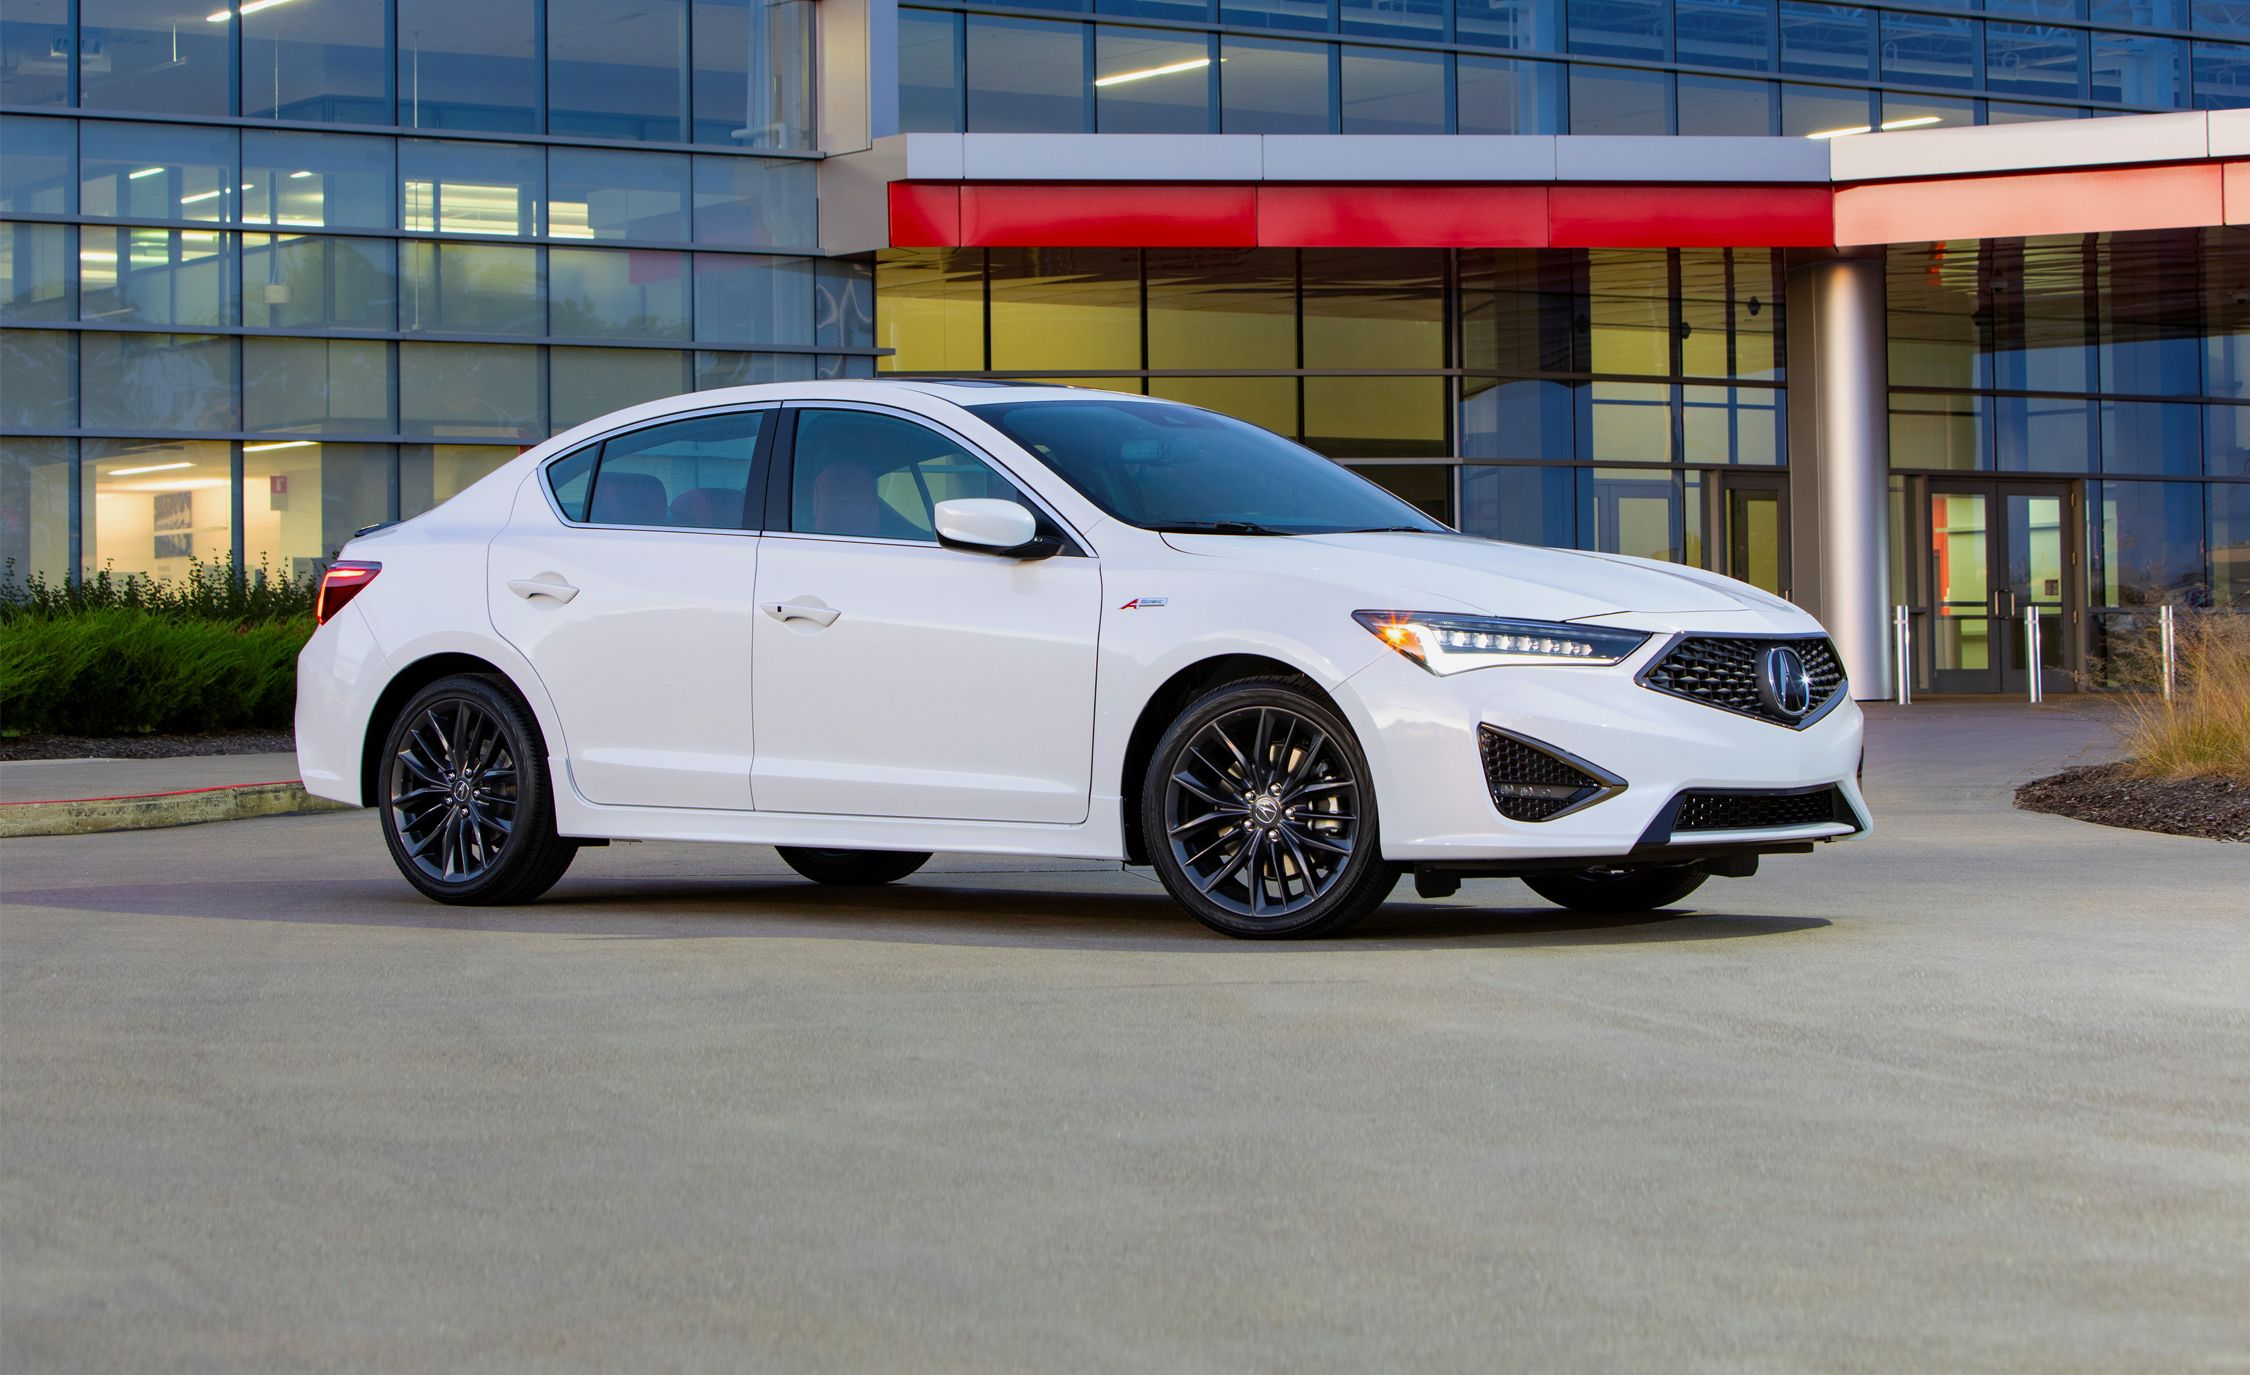 2019 Acura Ilx A Spec Good Value Modest Excitement